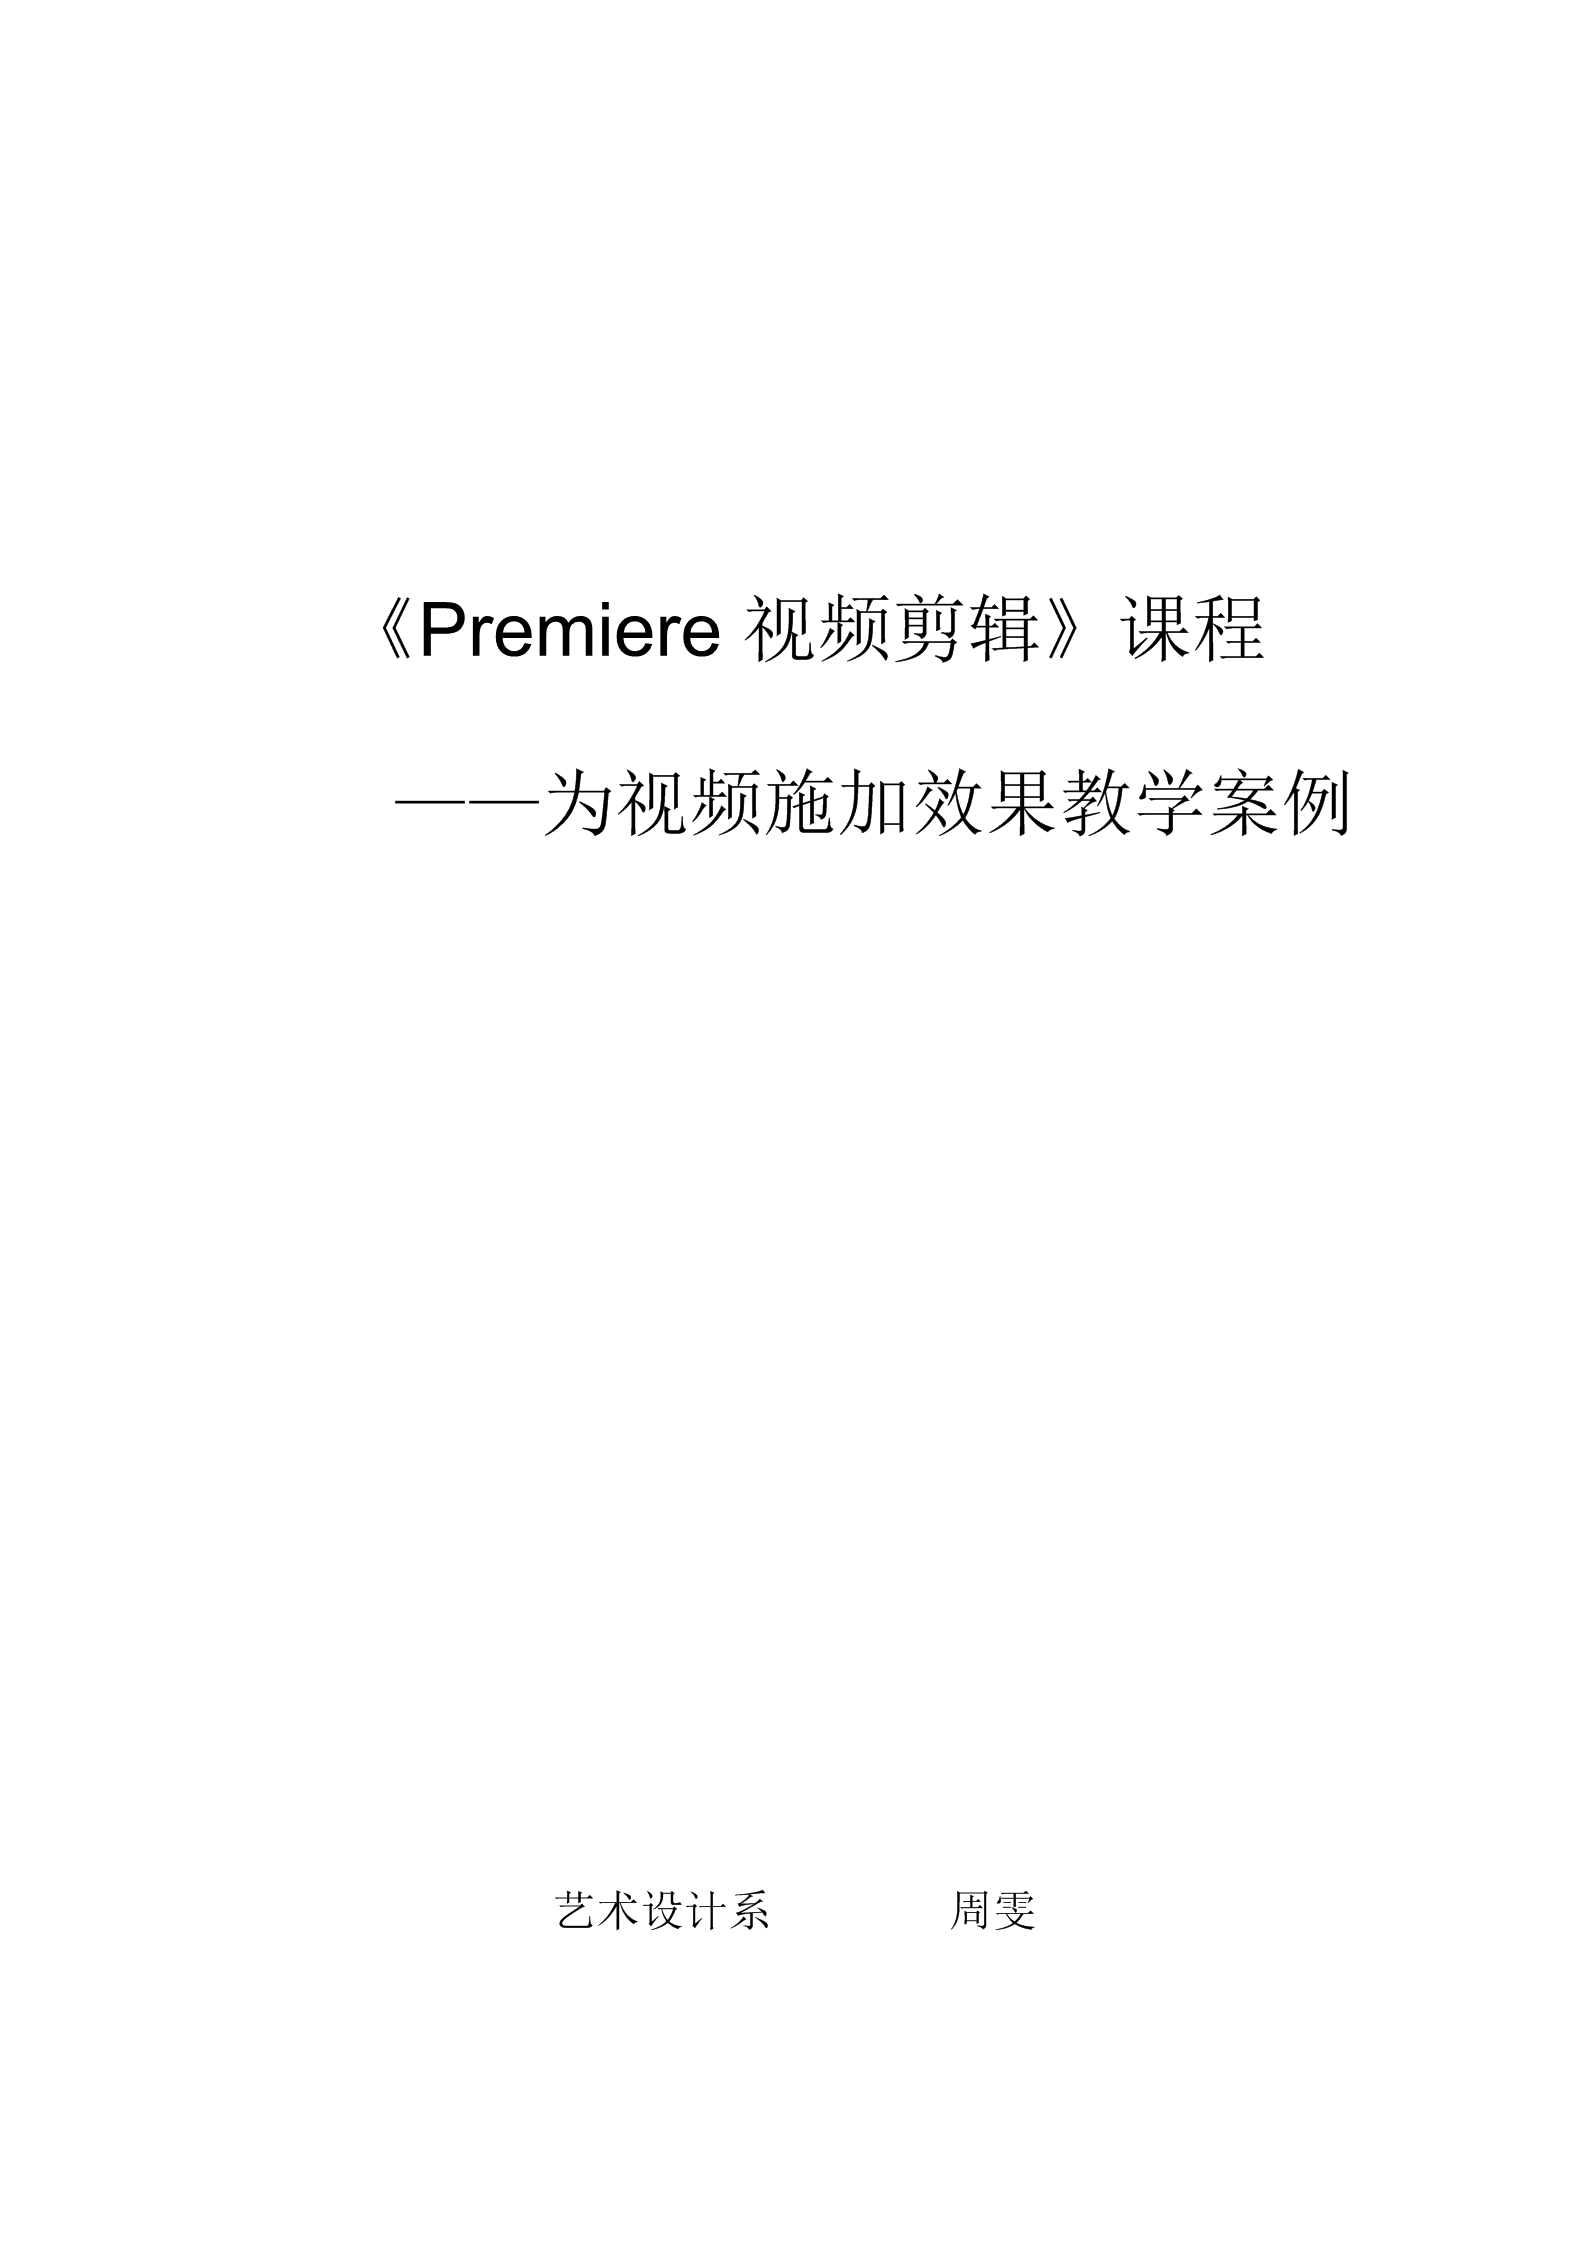 Premiere视频剪辑教学案例.docx